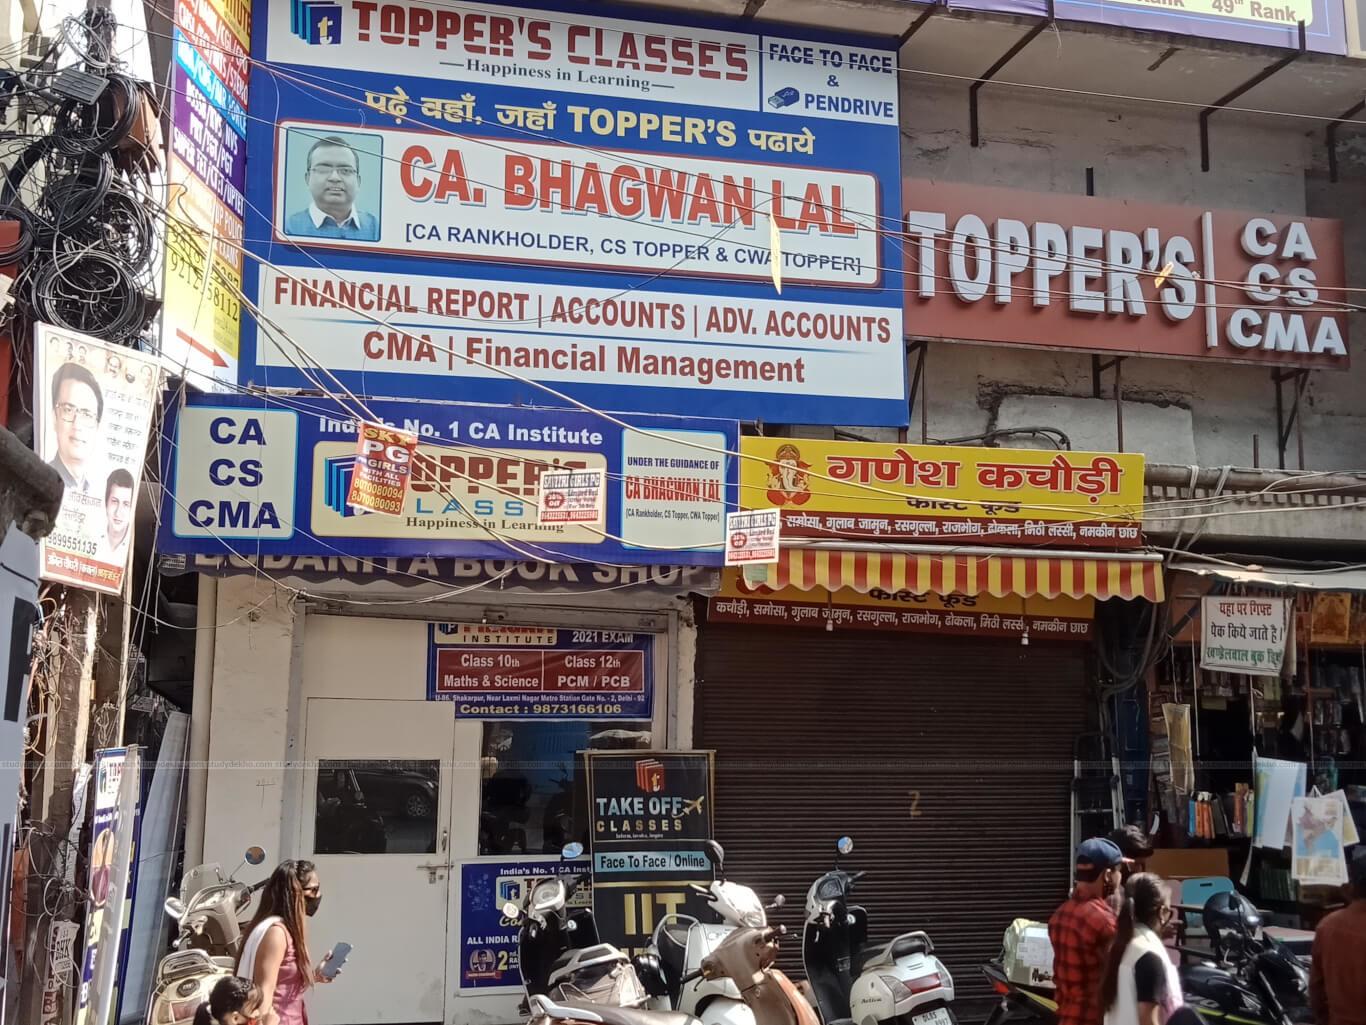 TOPPER'S CLASSES Logo